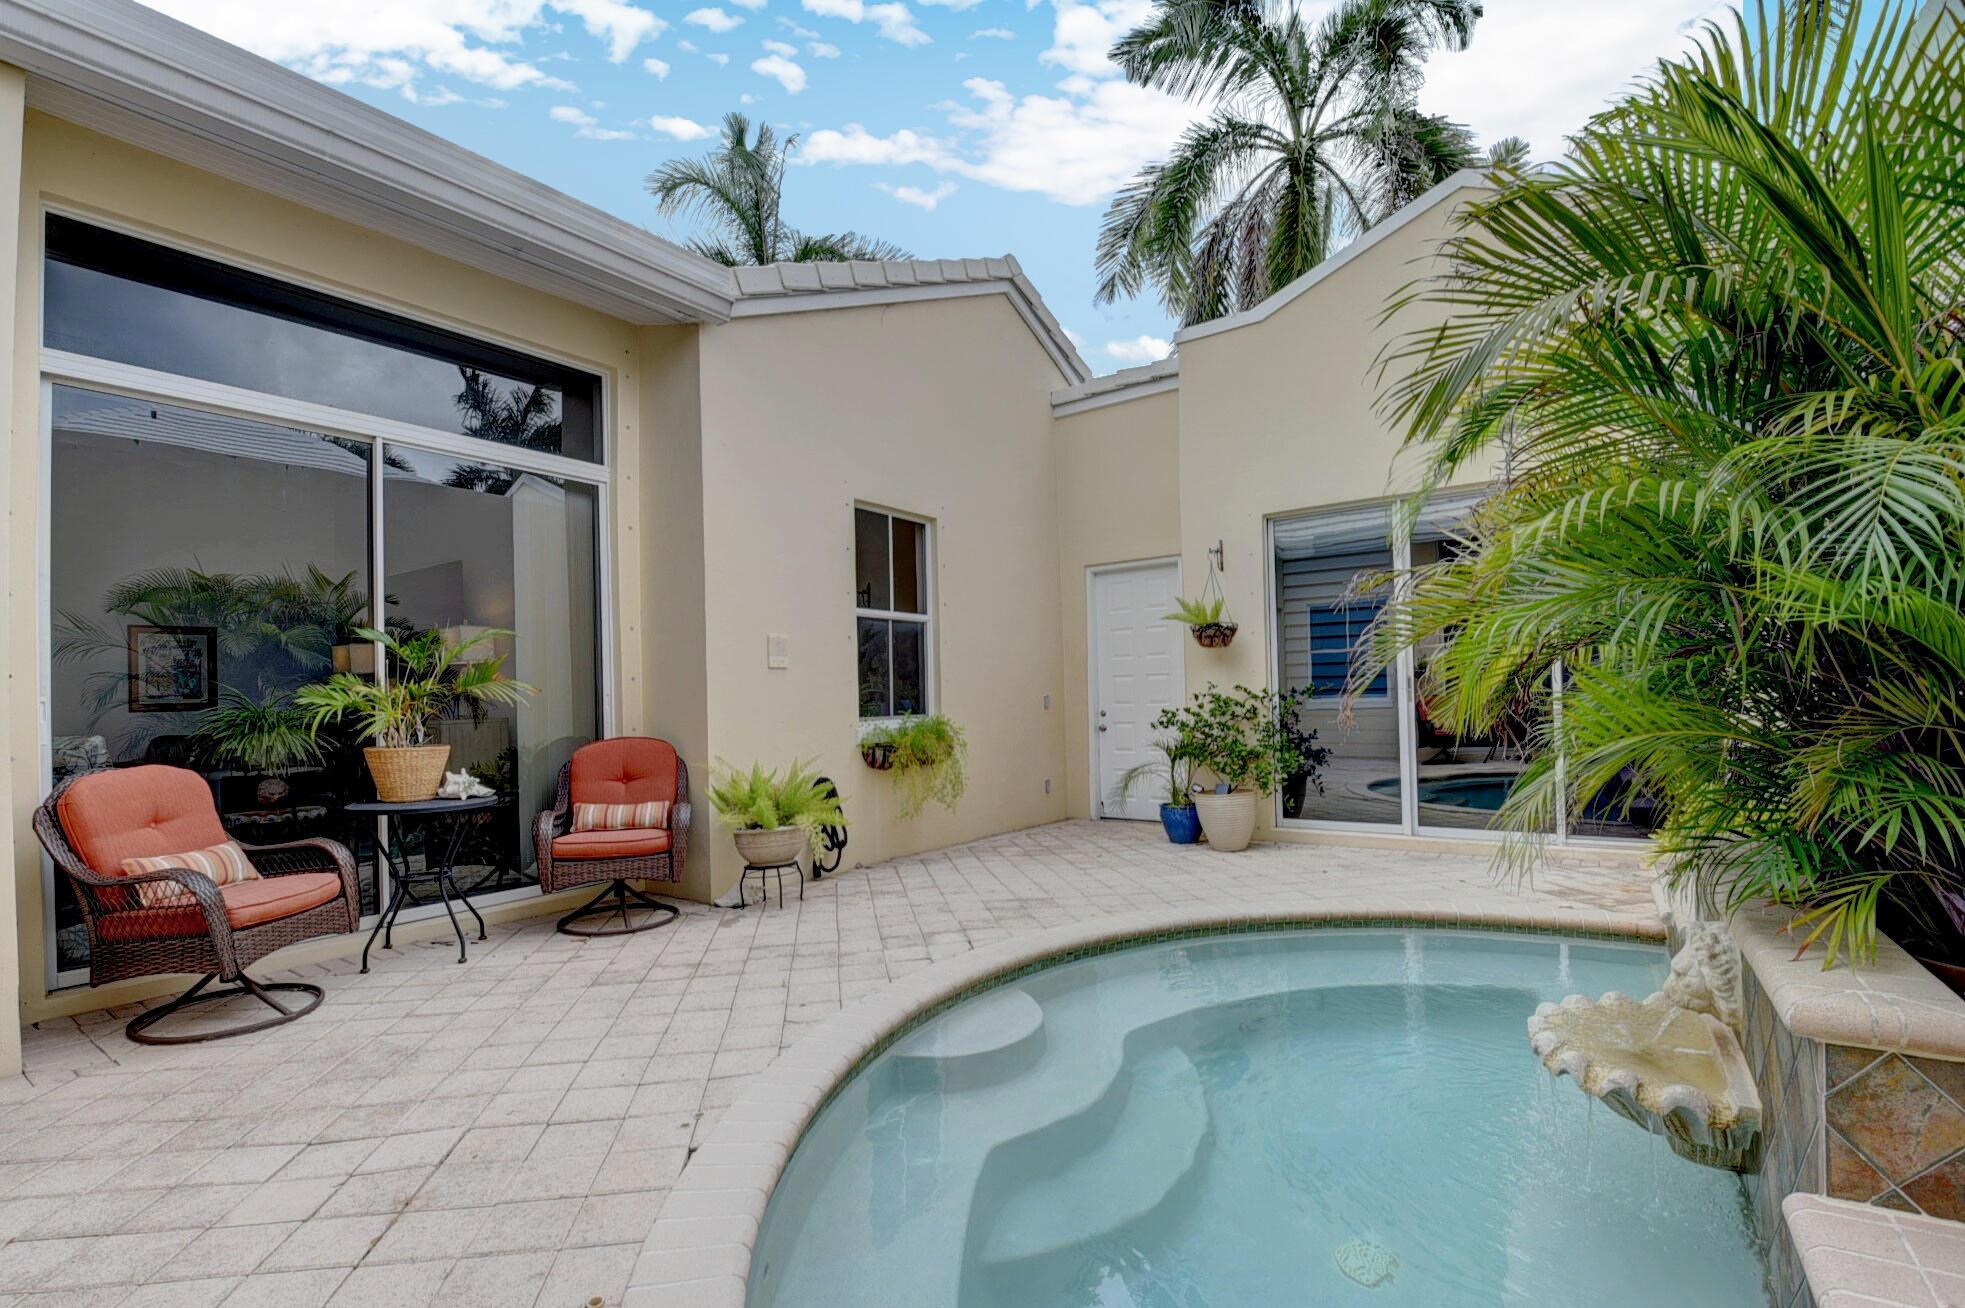 Photo of 17143 Bermuda Village Drive, Boca Raton, FL 33487